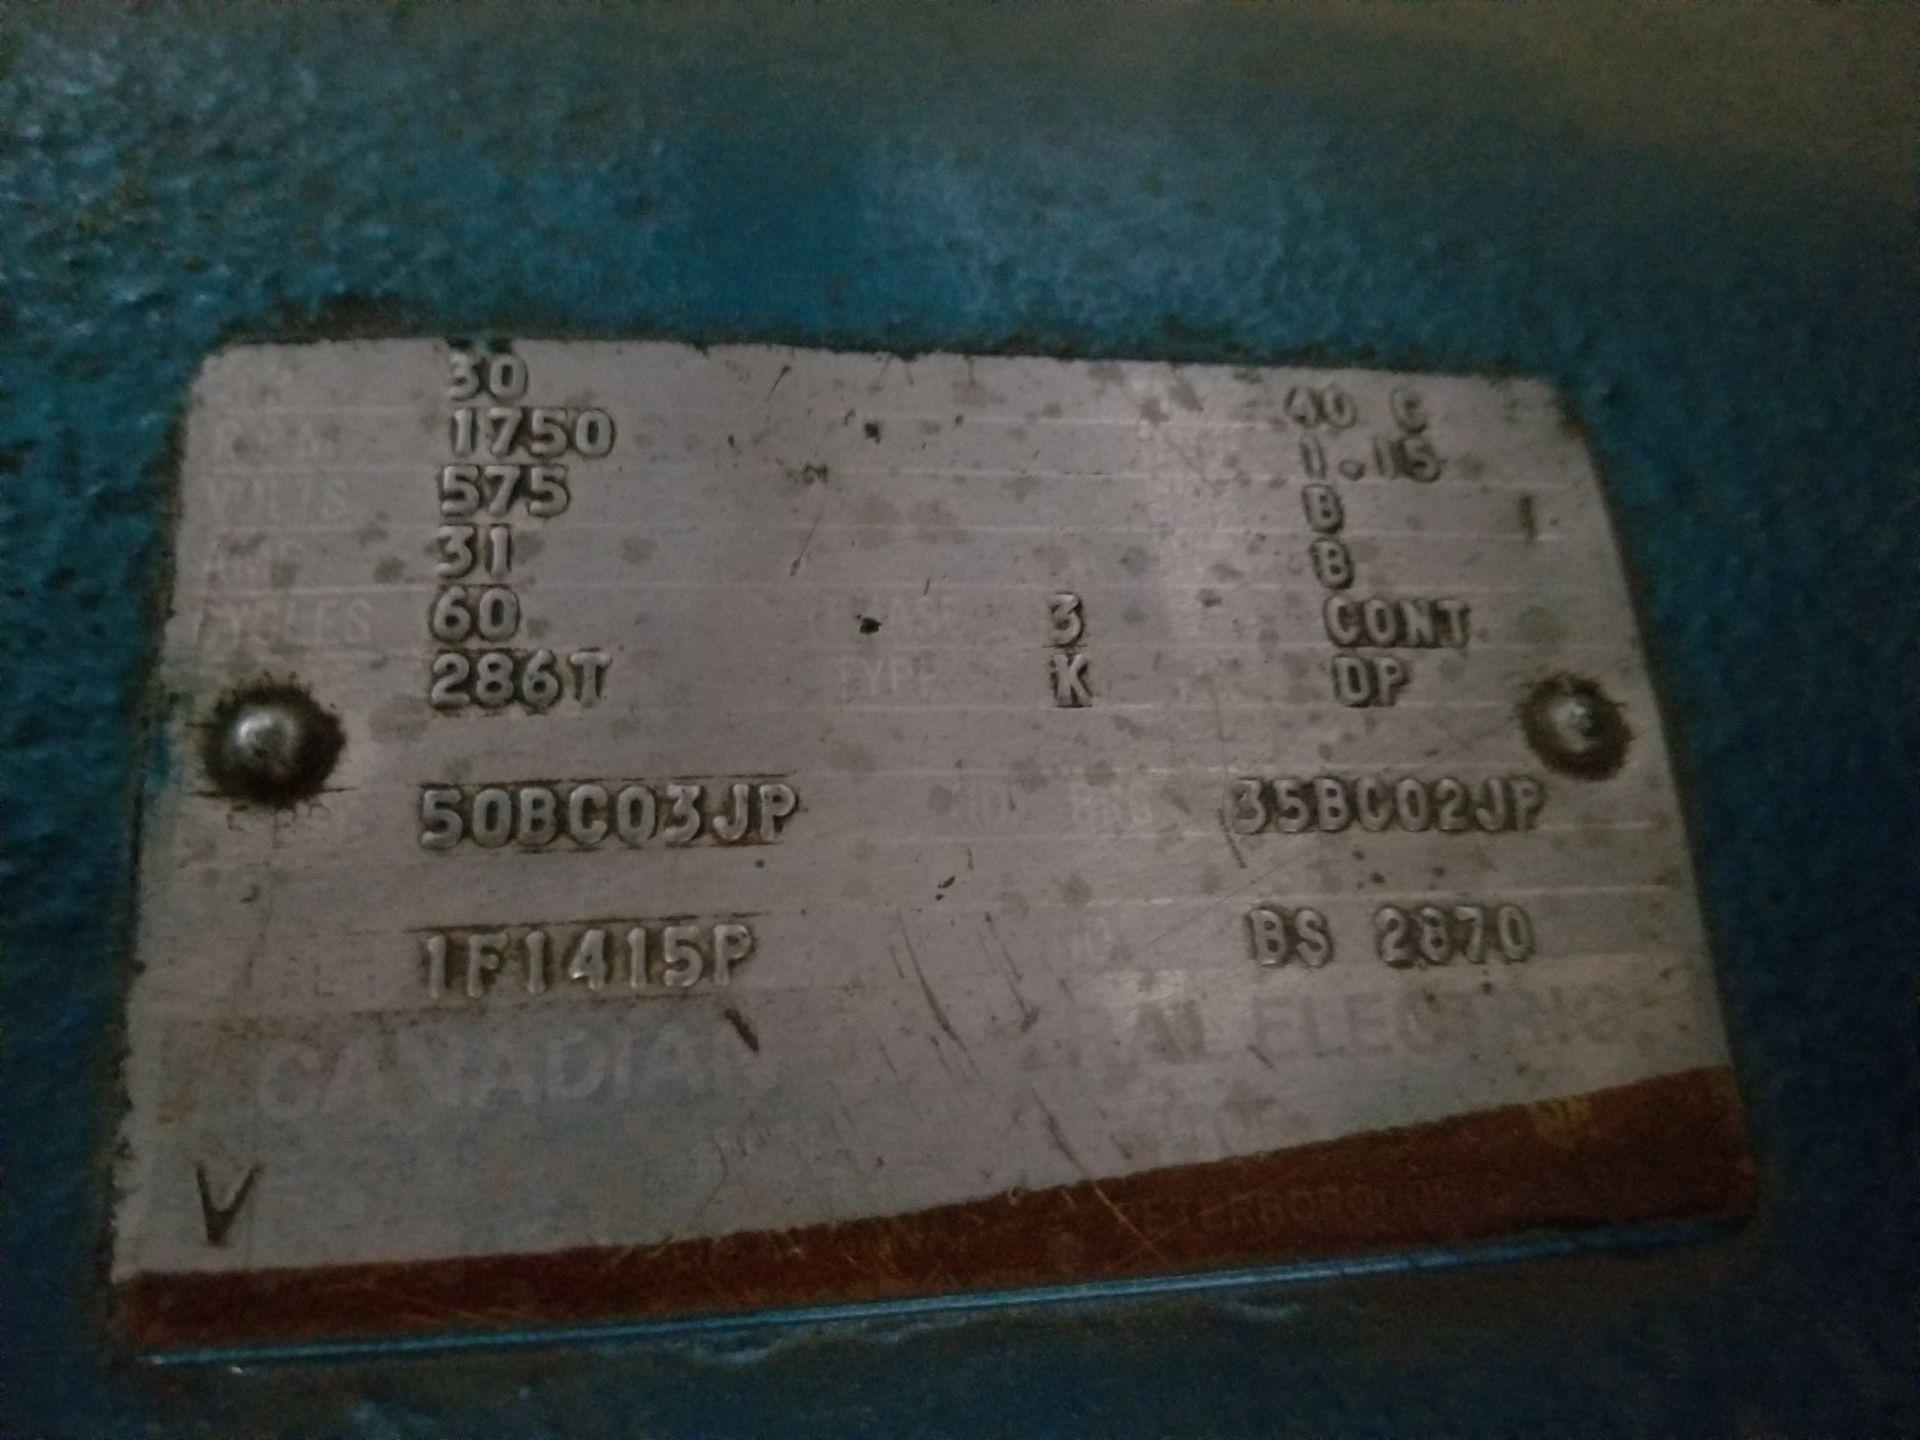 575 volt compressor, dryer, cooler / Compresseur 575 volts, assécheur - Image 2 of 4